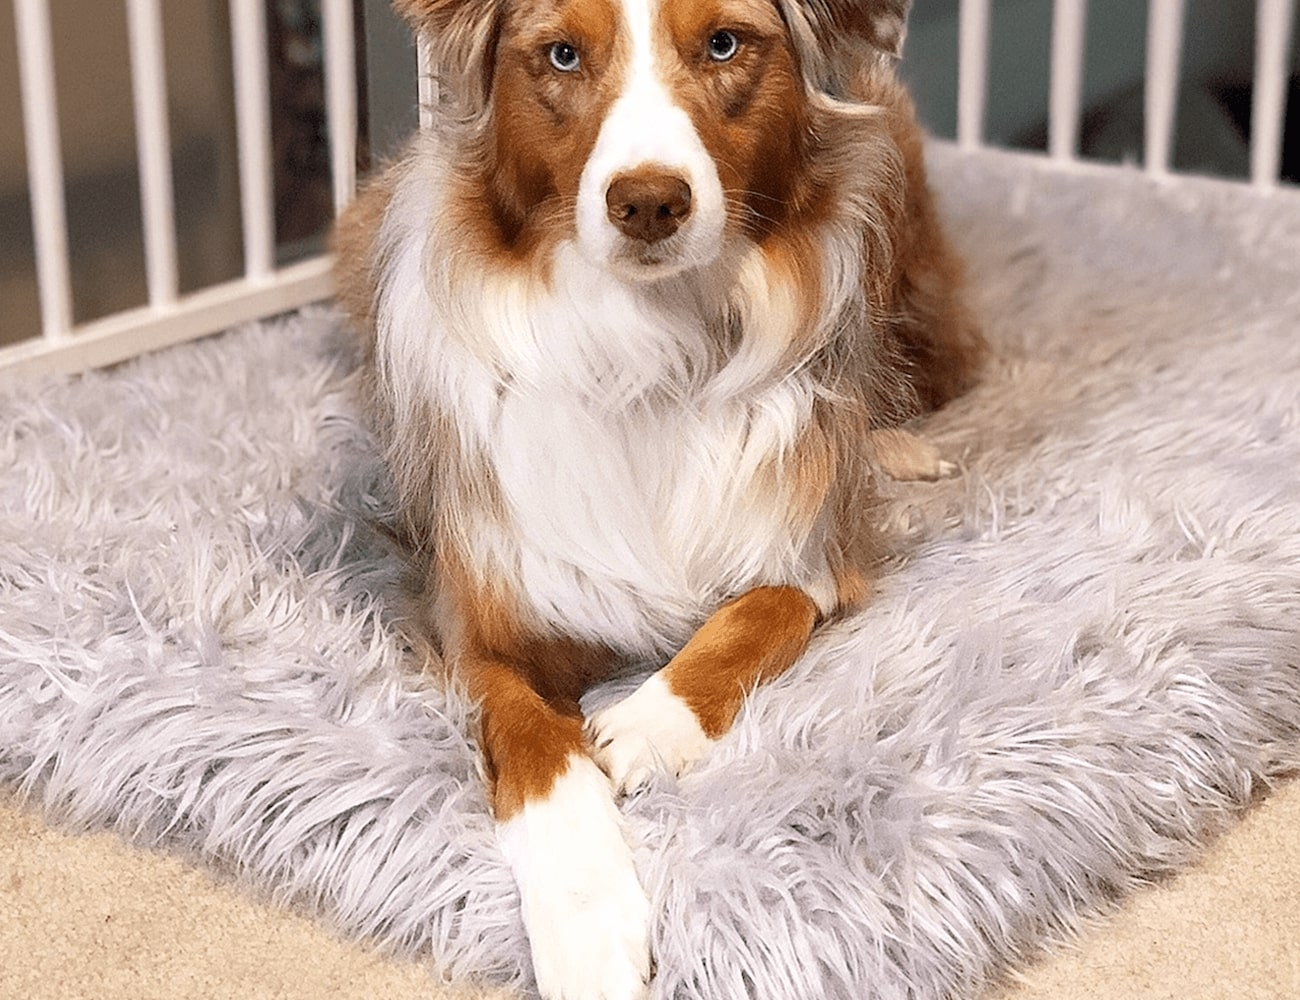 PupRug Faux Fur Orthopedic Dog Bed » Gadget Flow